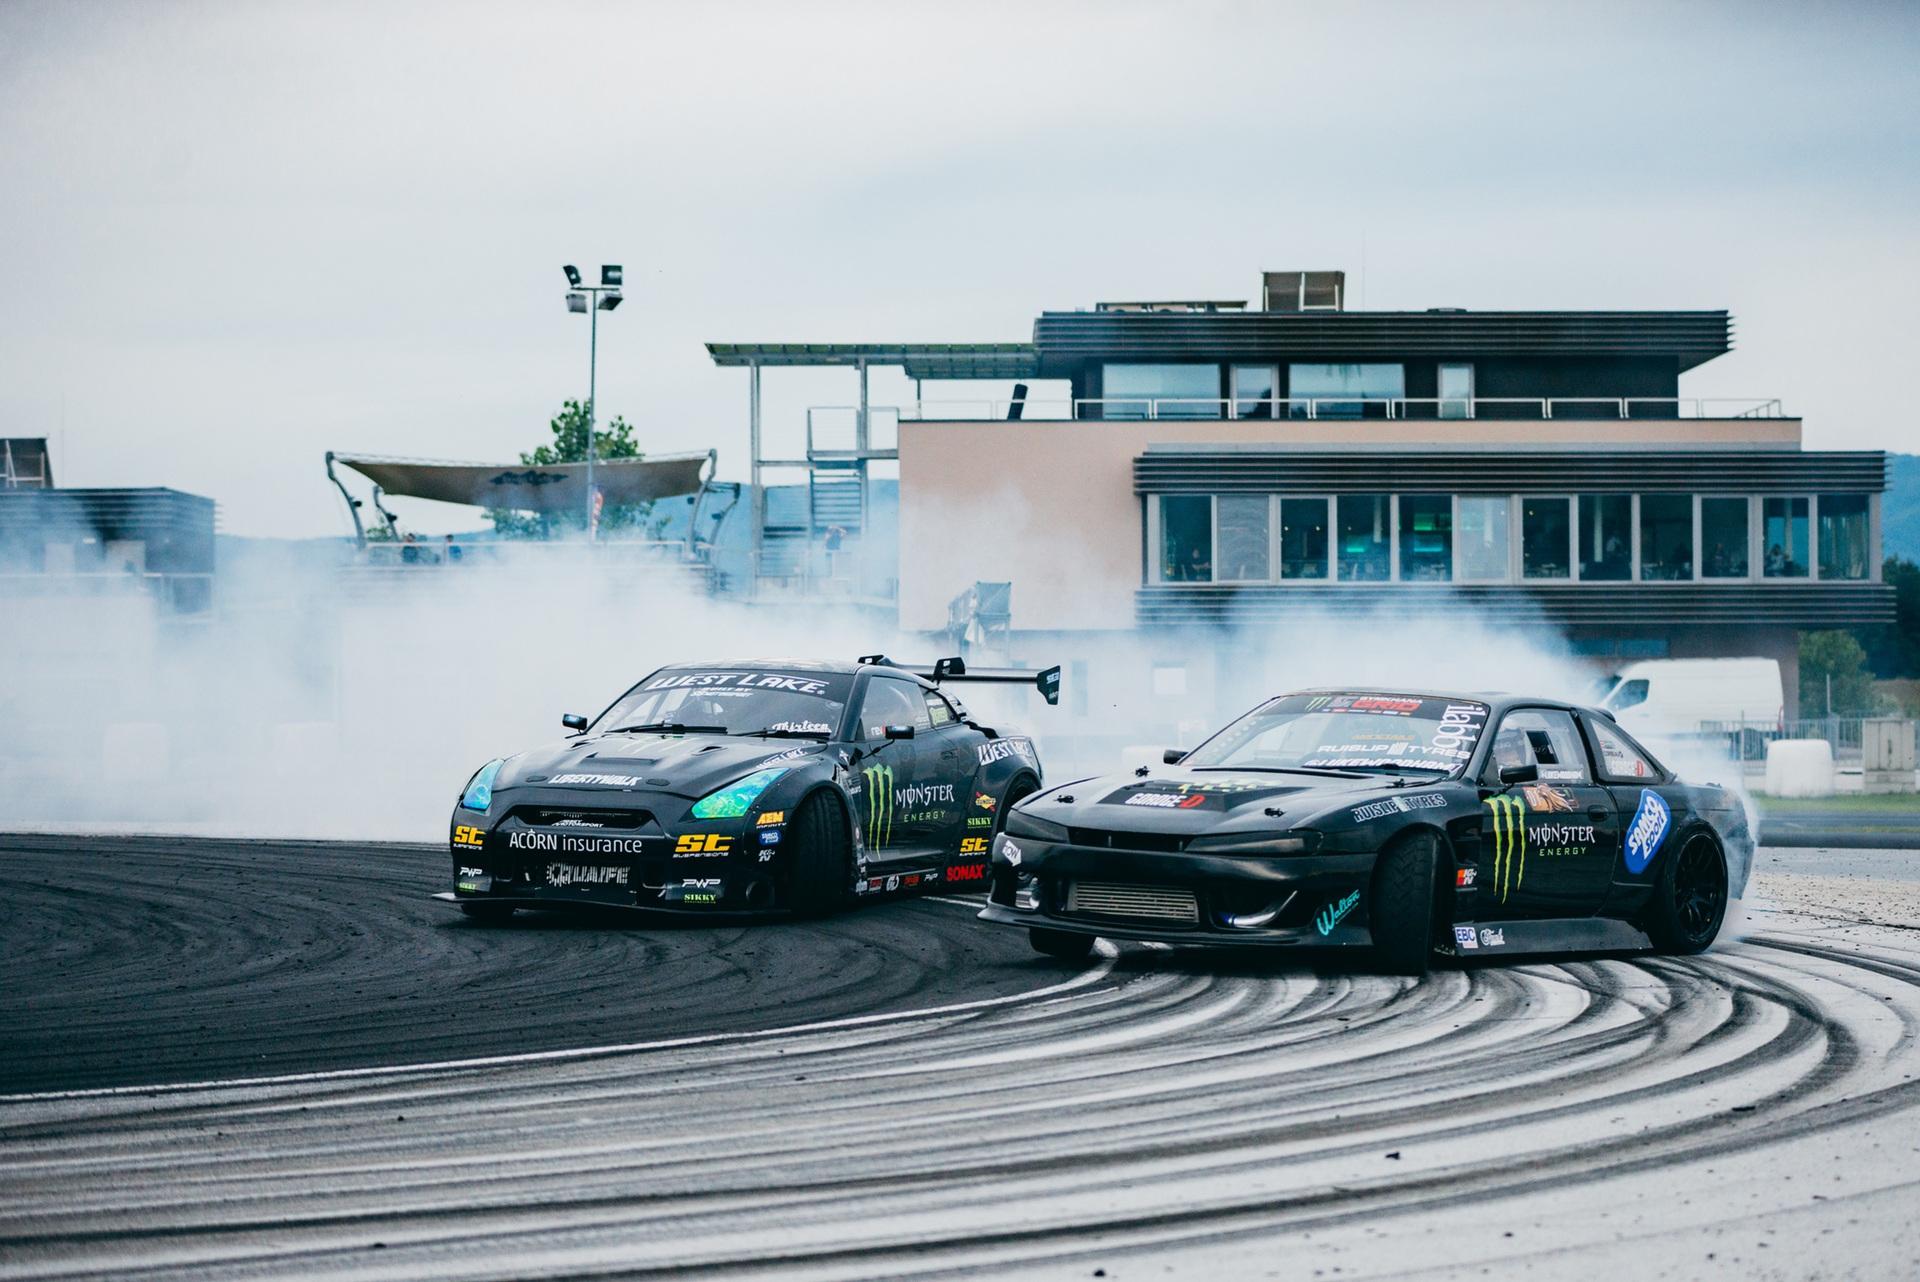 Klemen-Humar_2018-06_Monster-Tsuiso-Experience-142